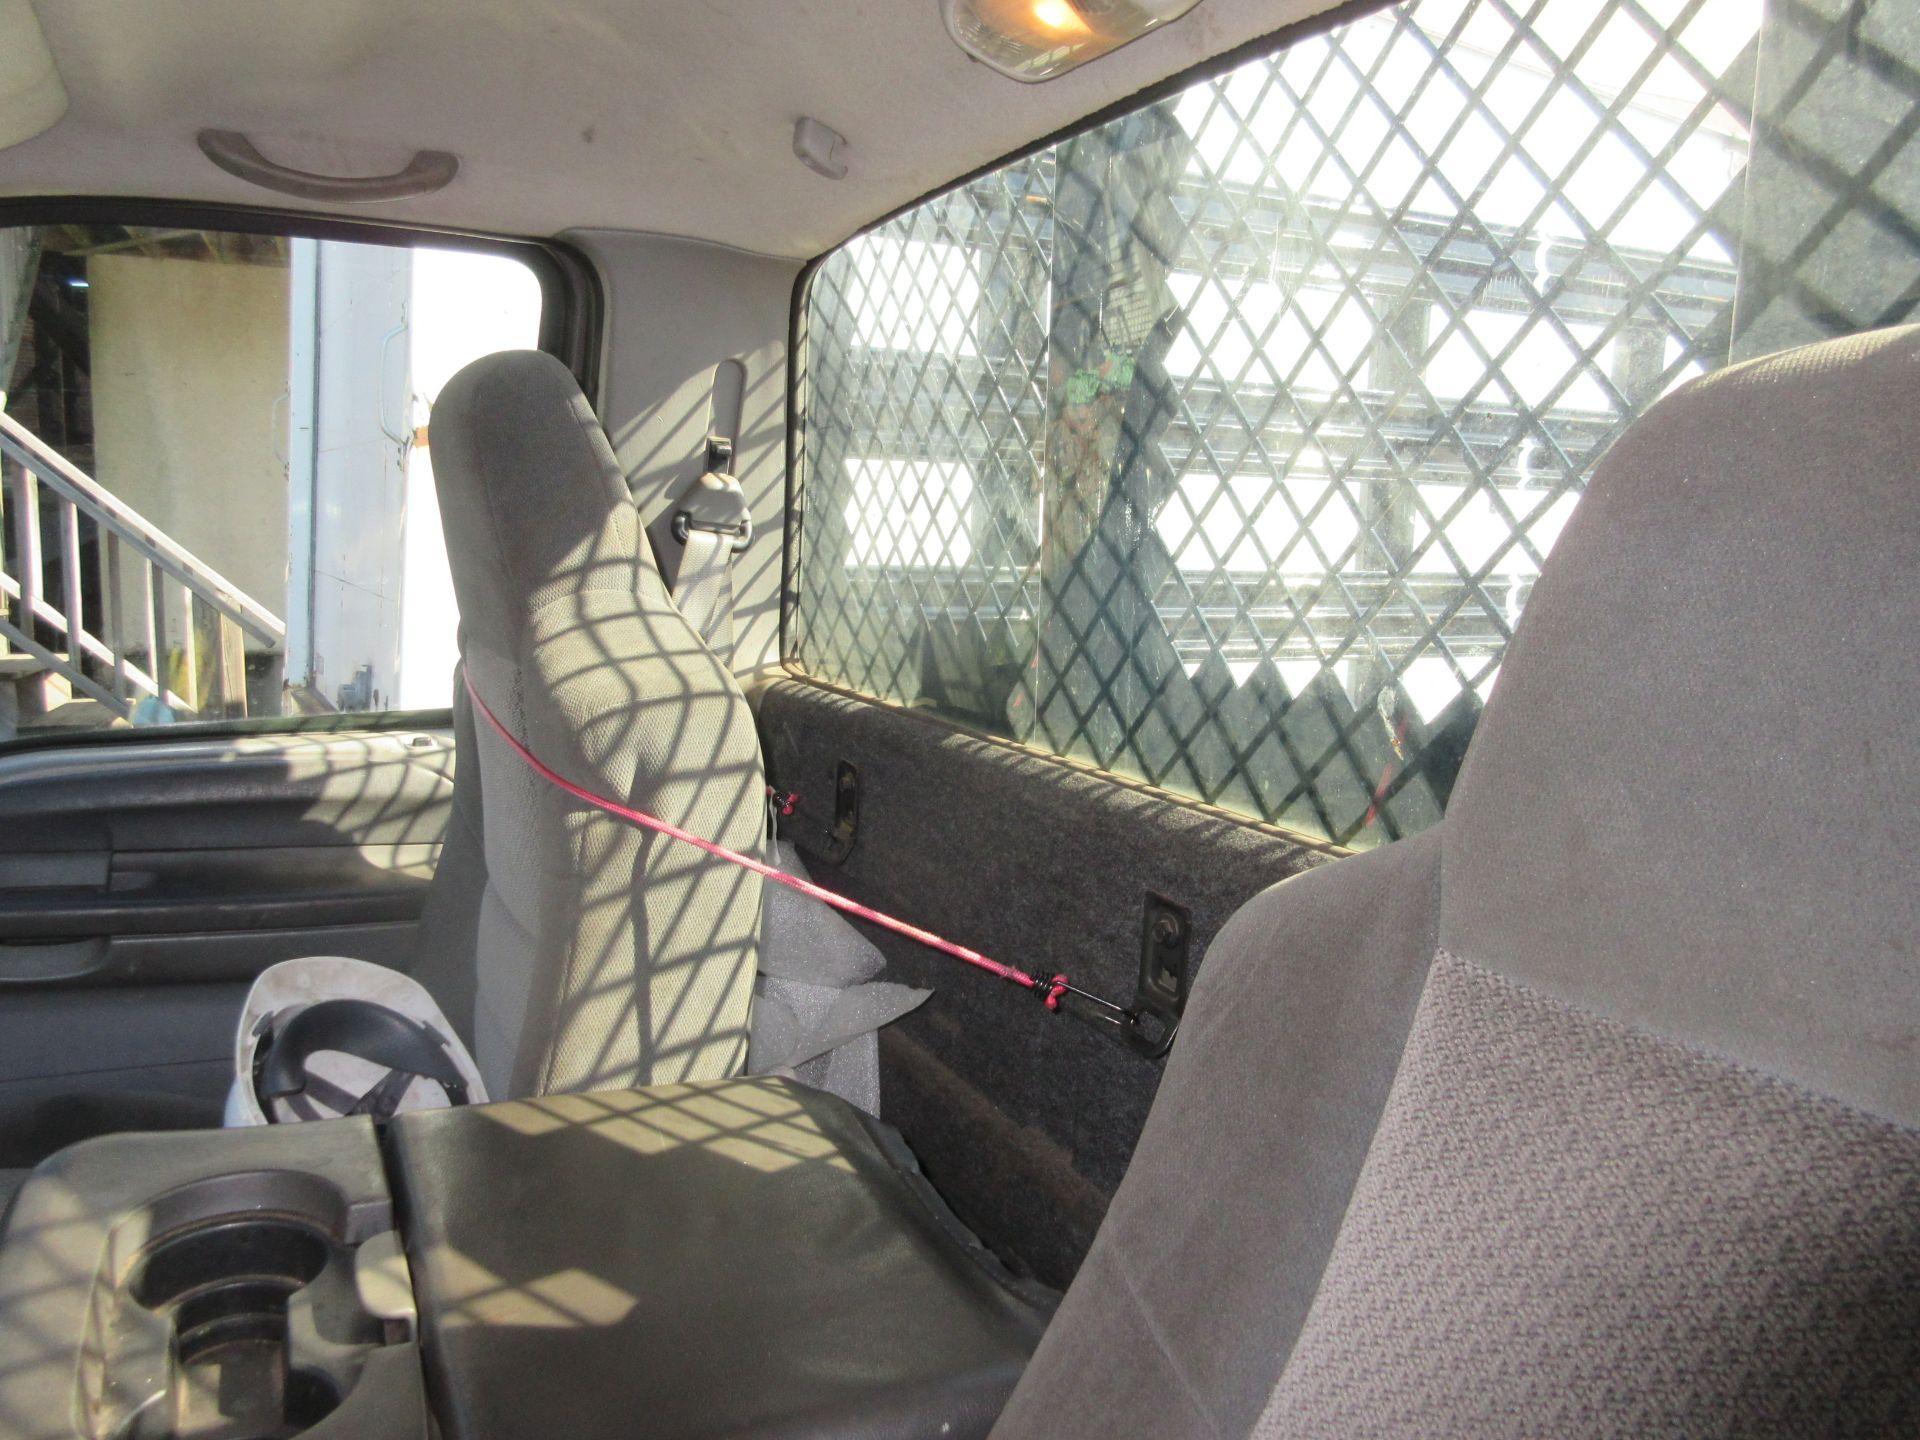 2002 Ford F-350 XLT Super Duty Power Stroke Flatbed Truck VIN 1FDWF37F62EB29656, Reading Body, - Image 11 of 13